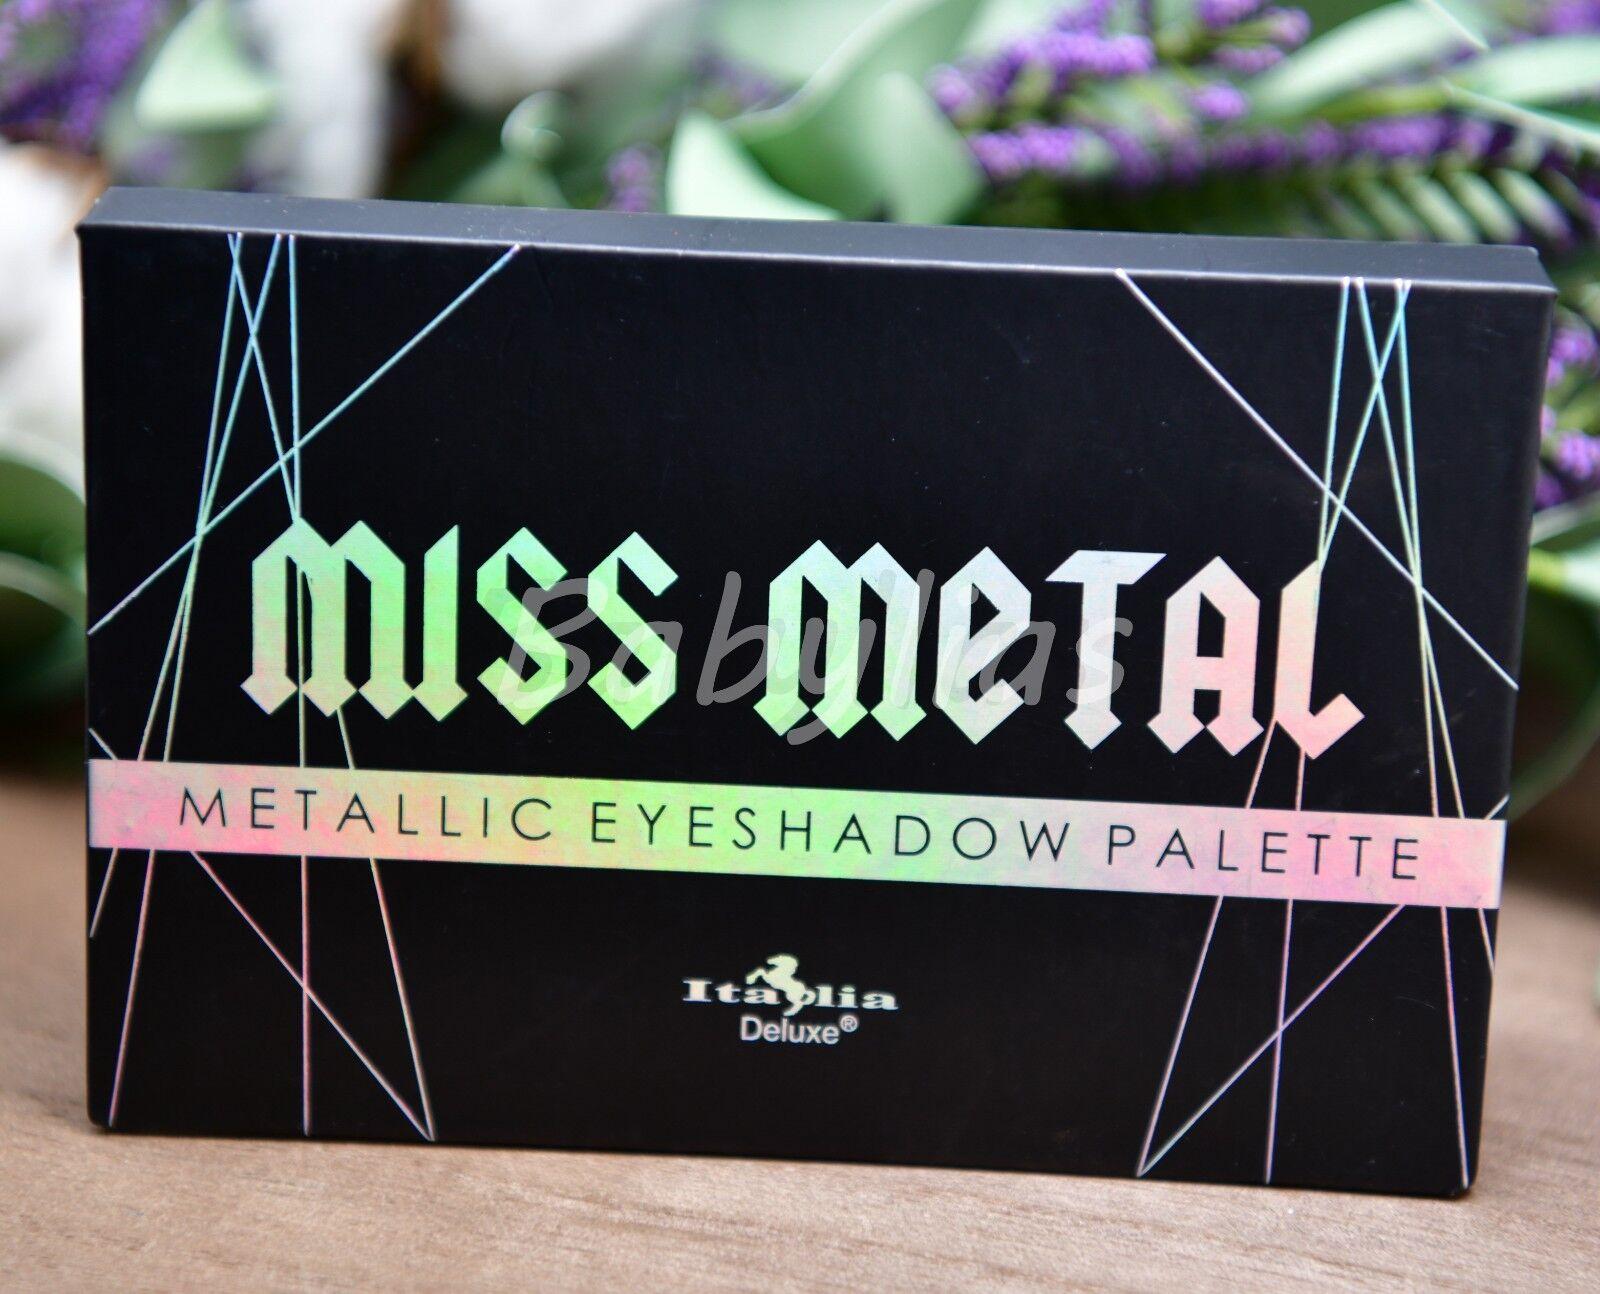 Miss Metals Eyeshadow Palette Shimmer Pigment Metallic Vivid